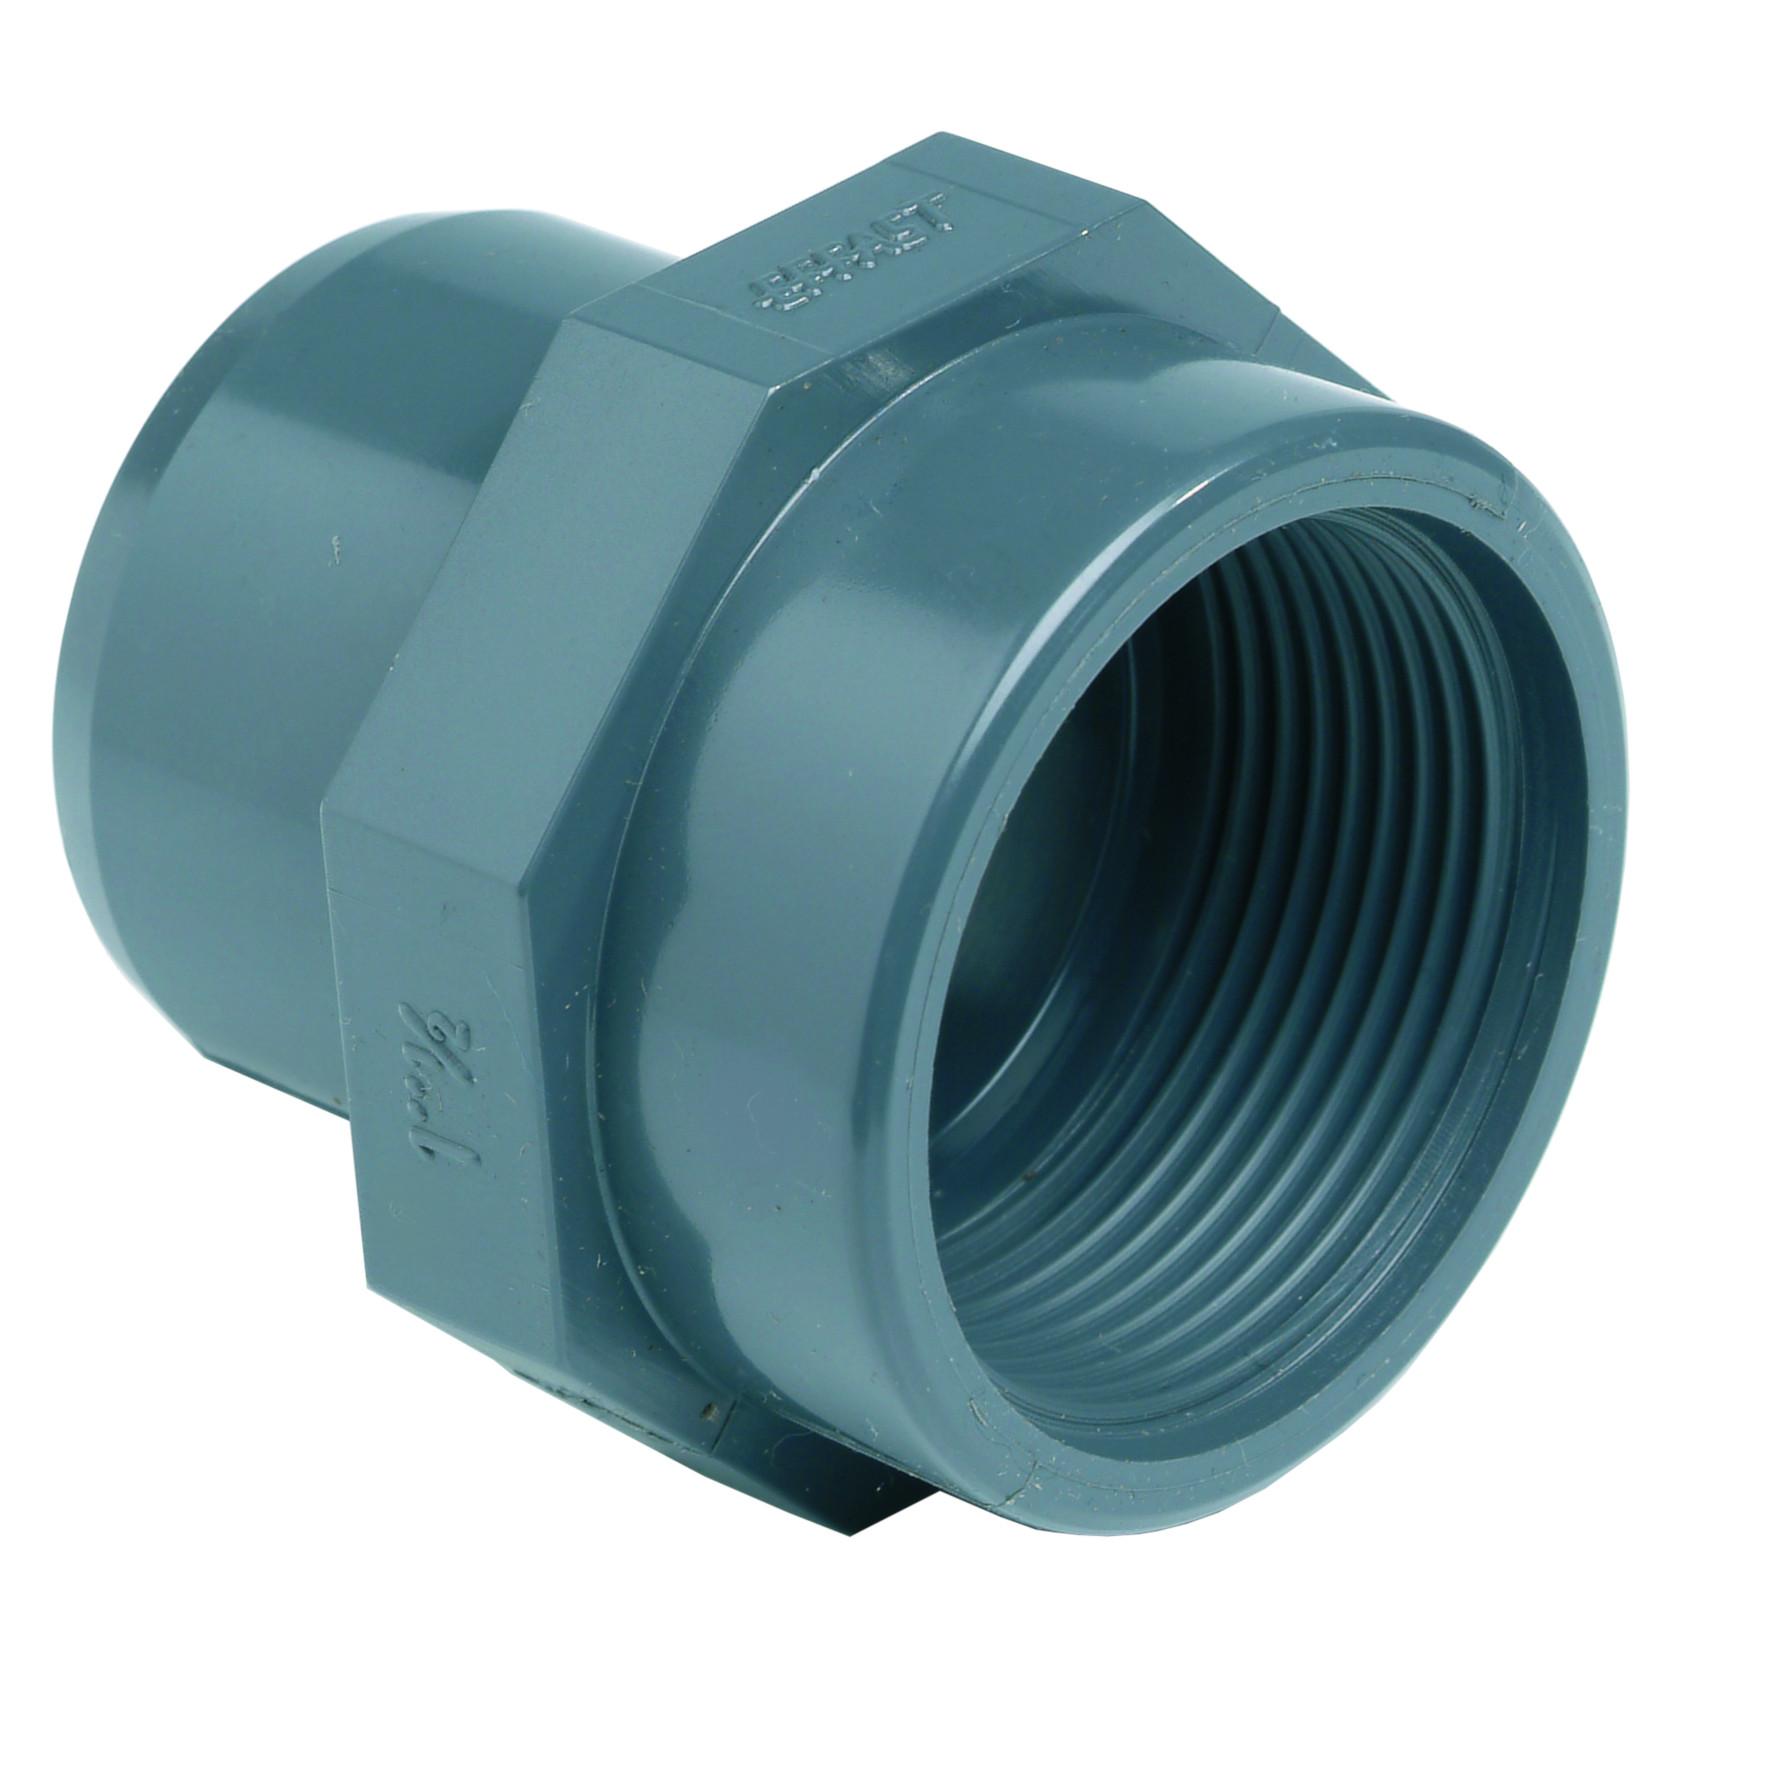 PVC-U female adaptor - EFFAST - 100% Made in Italy